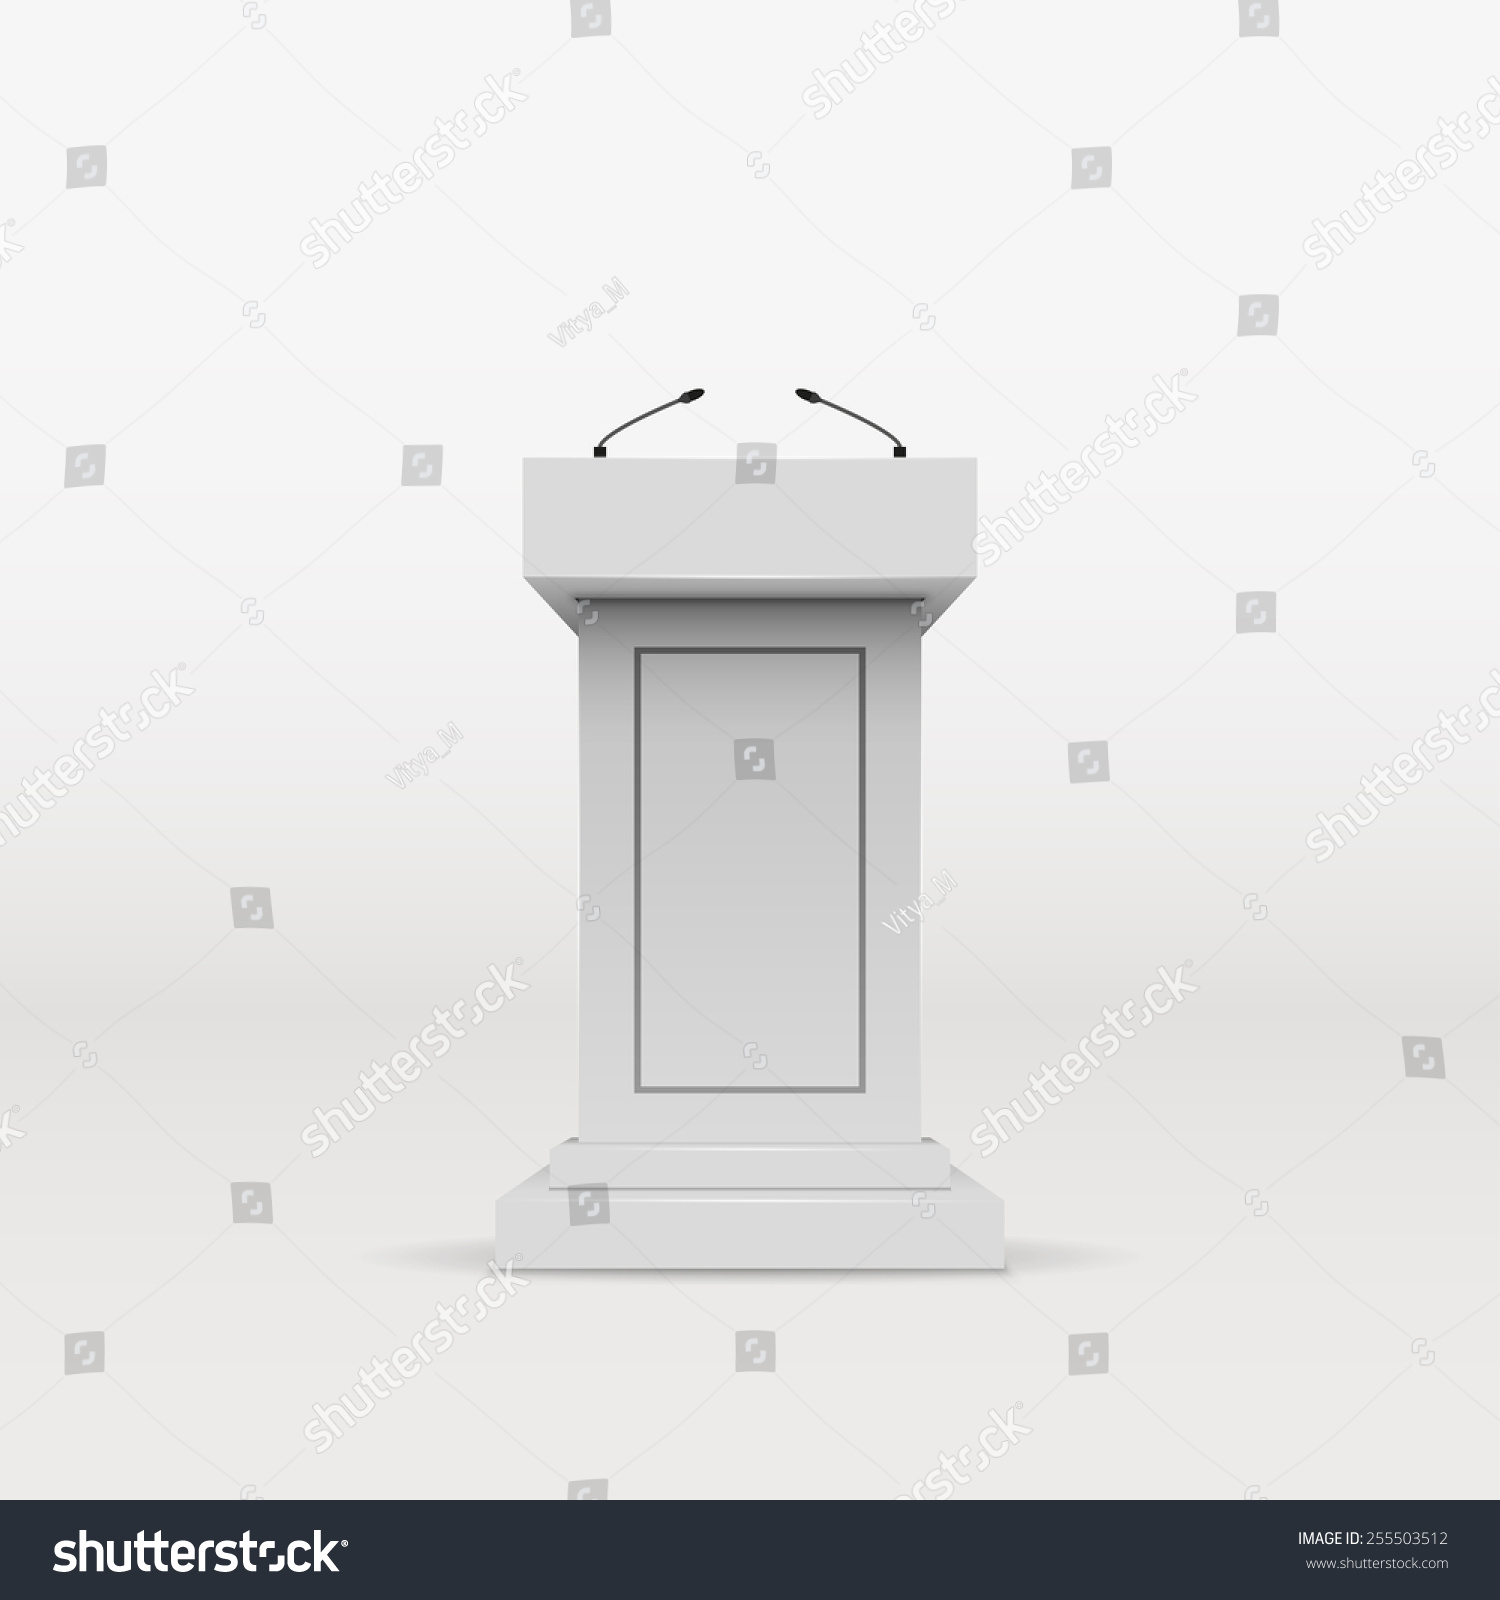 White Studio Background With Podium: Vector White Podium Tribune Rostrum Stand With Microphones